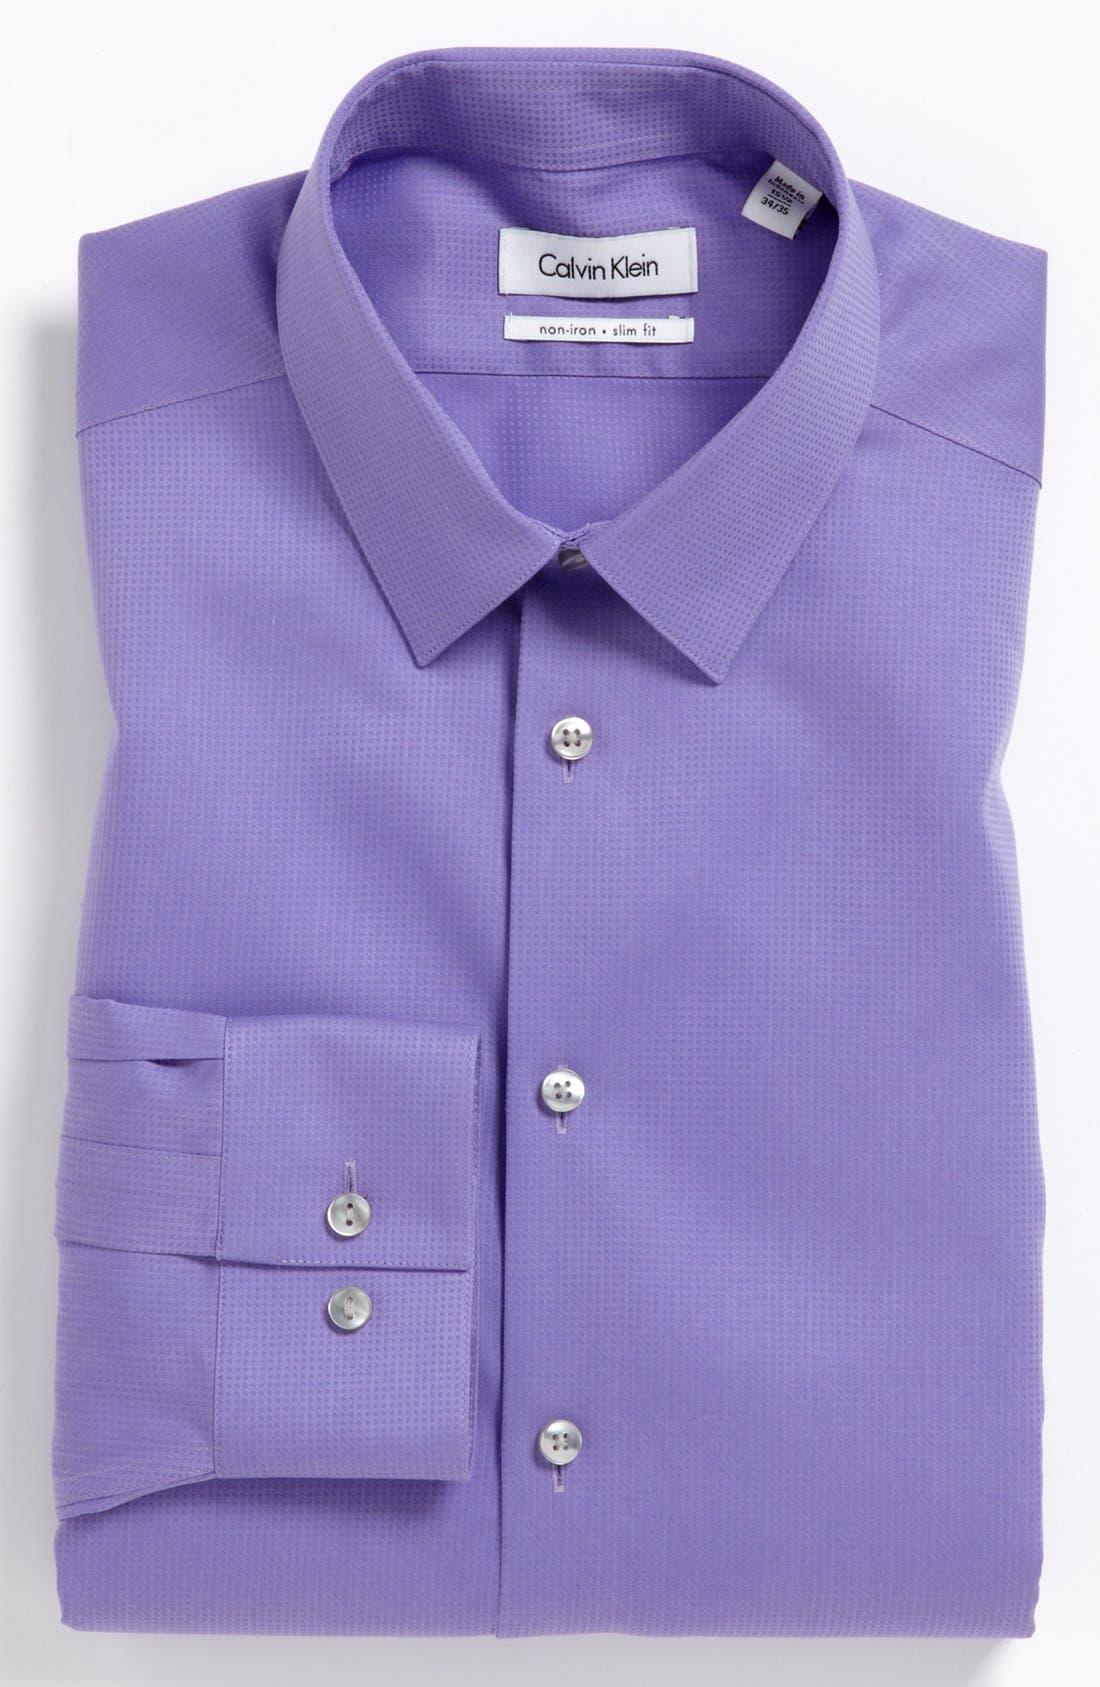 Alternate Image 1 Selected - Calvin Klein 'Miami Check' Slim Fit Non-Iron Dress Shirt